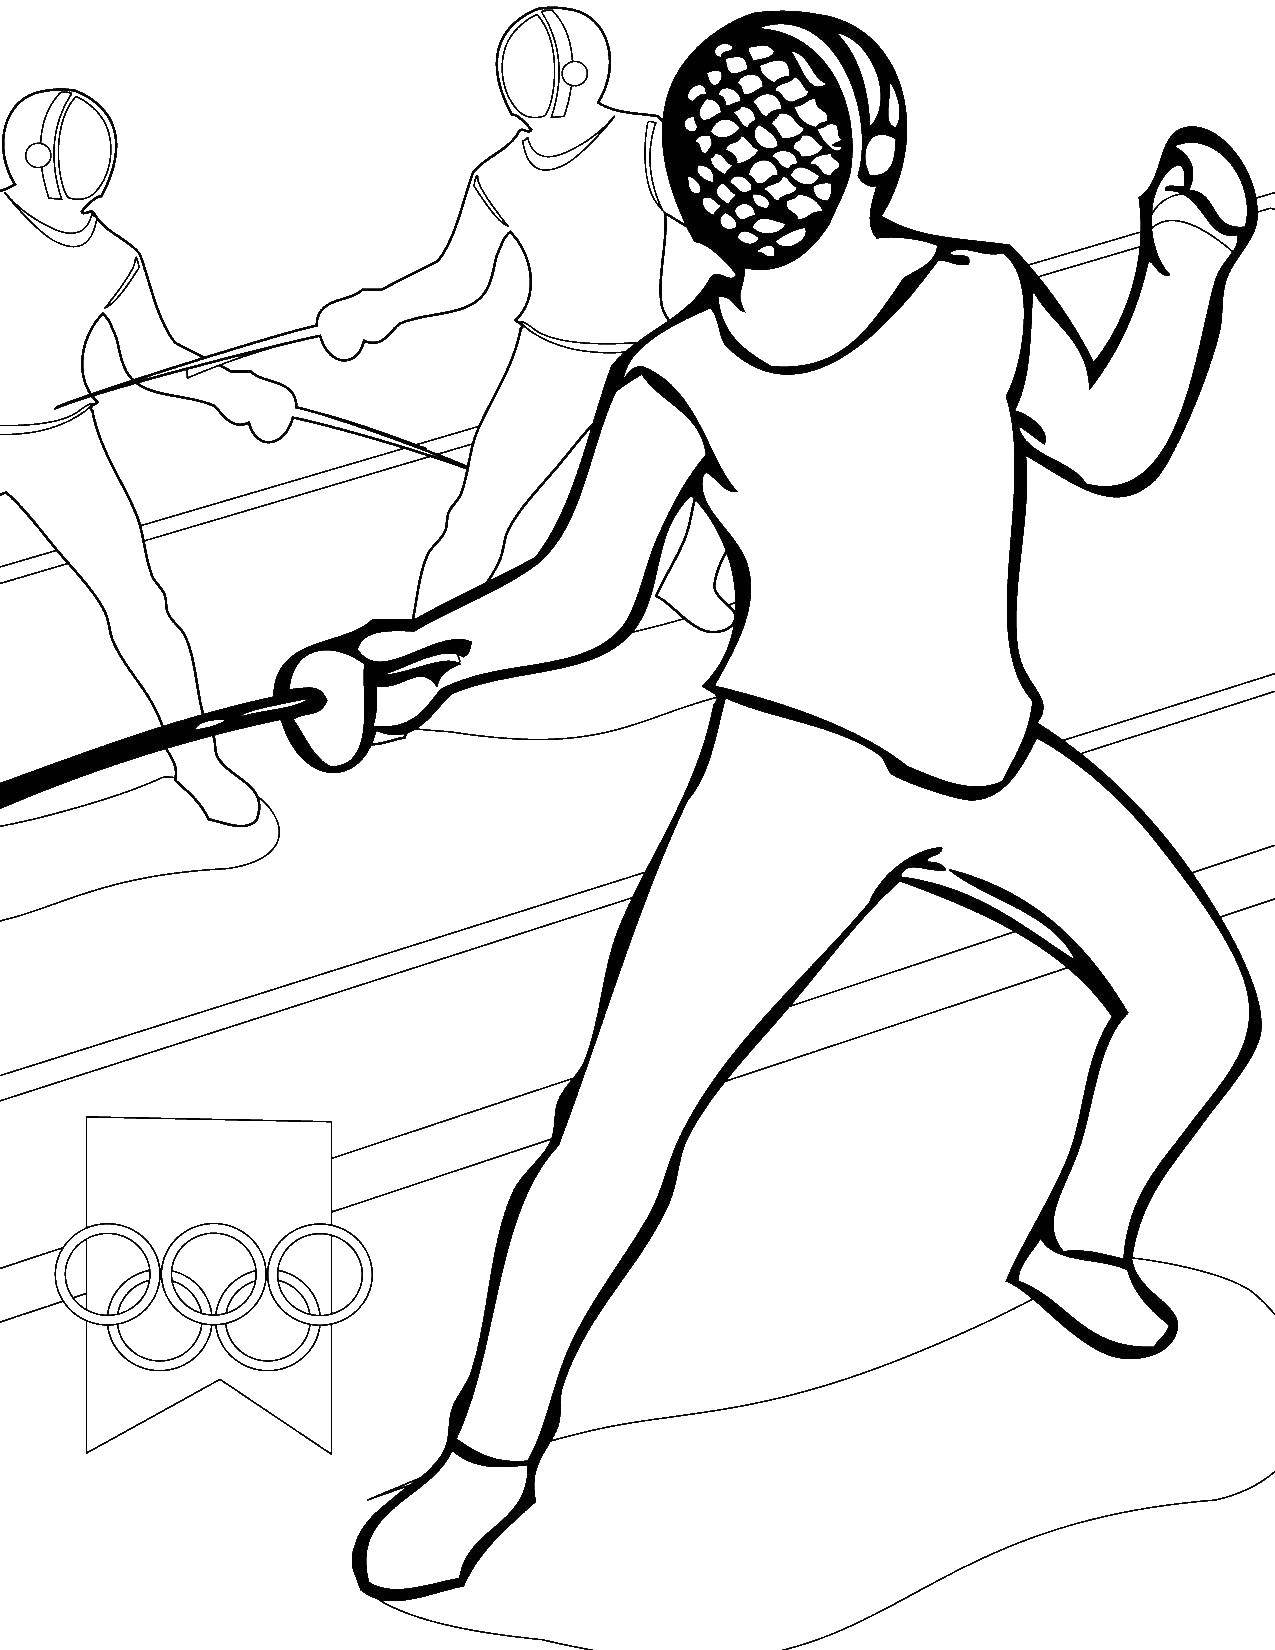 спортсмен на картинке для рисования